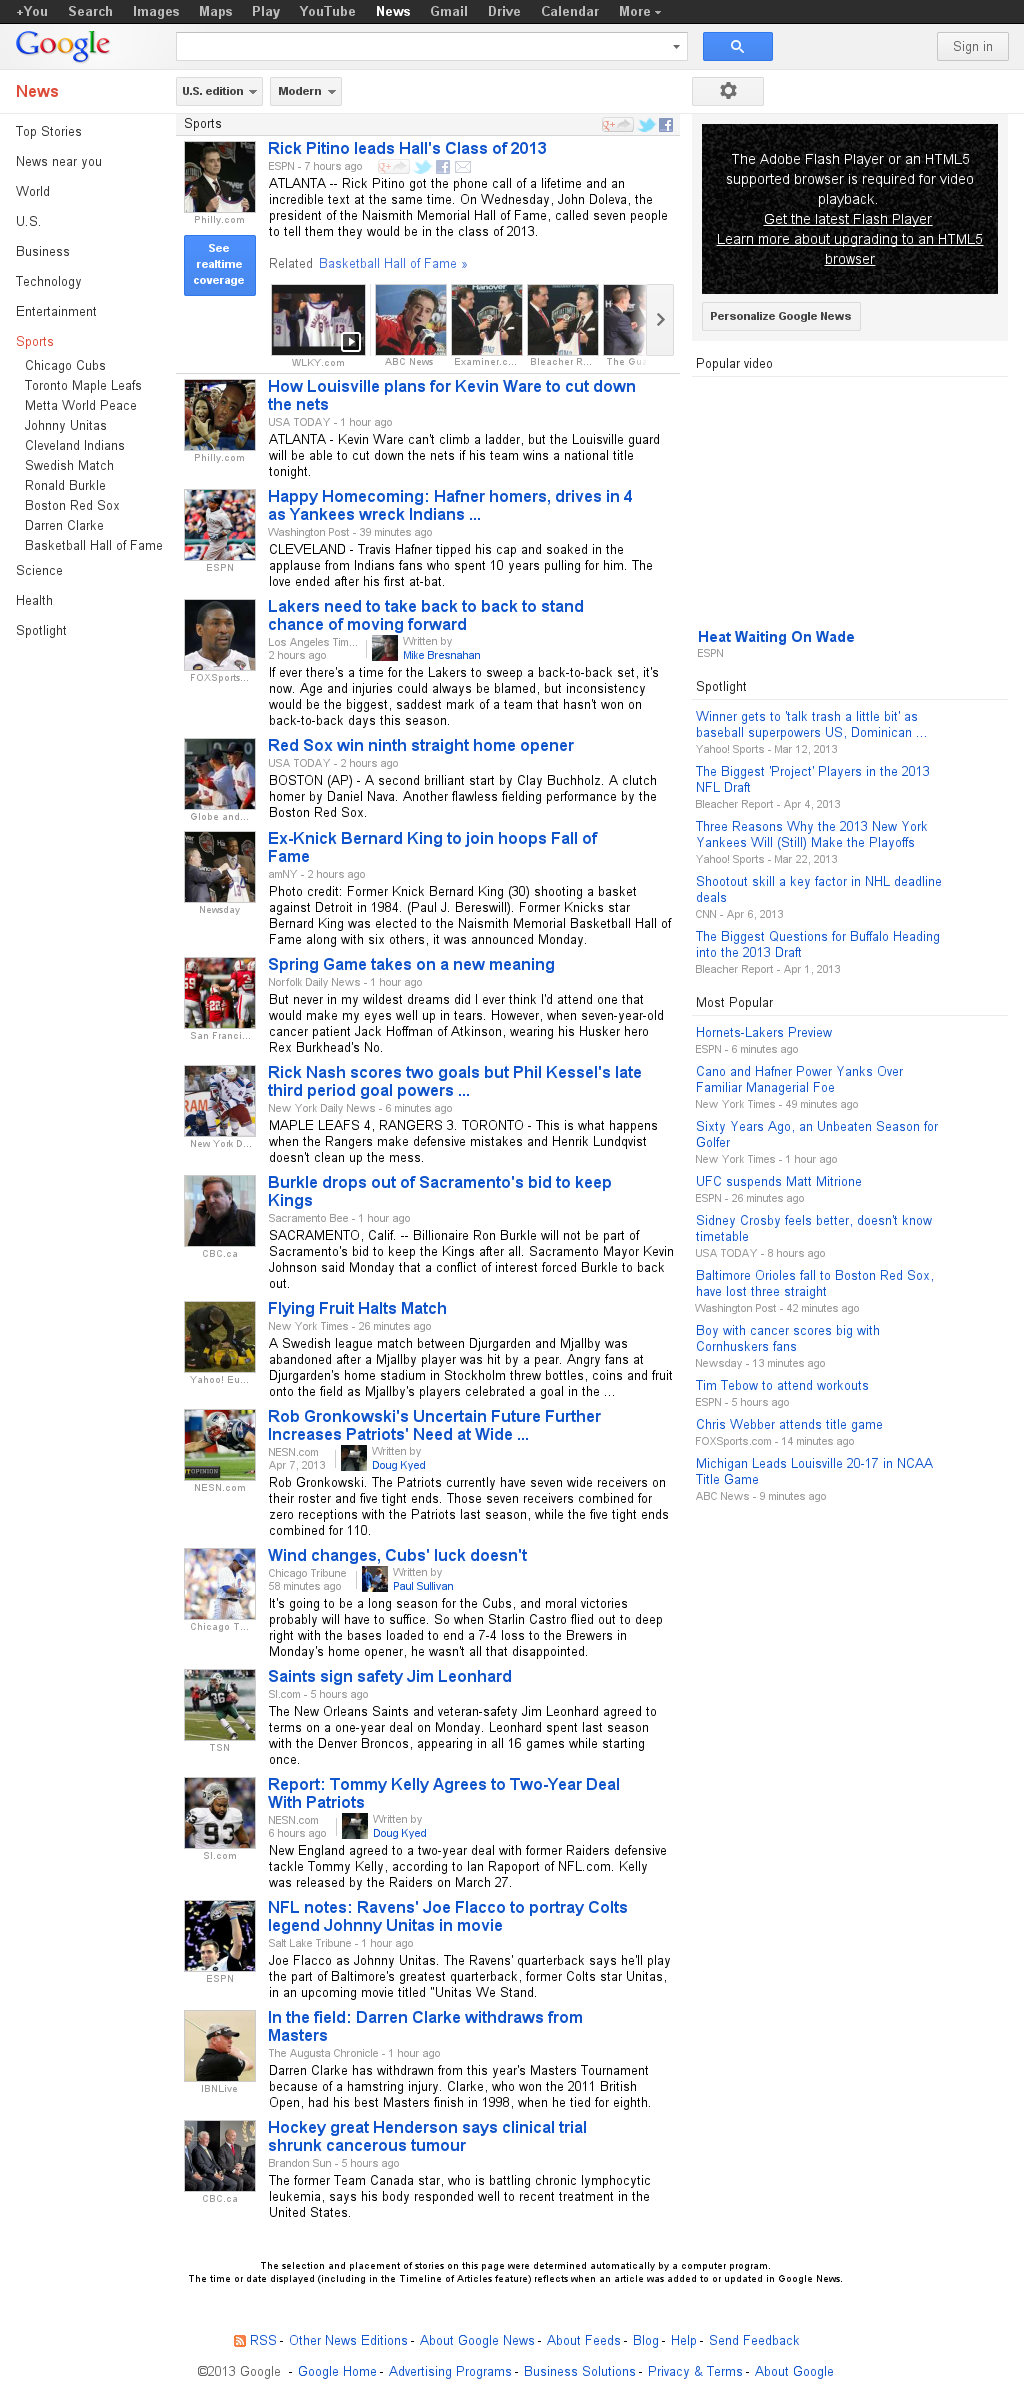 Google News: Sports at Tuesday April 9, 2013, 2:08 a.m. UTC